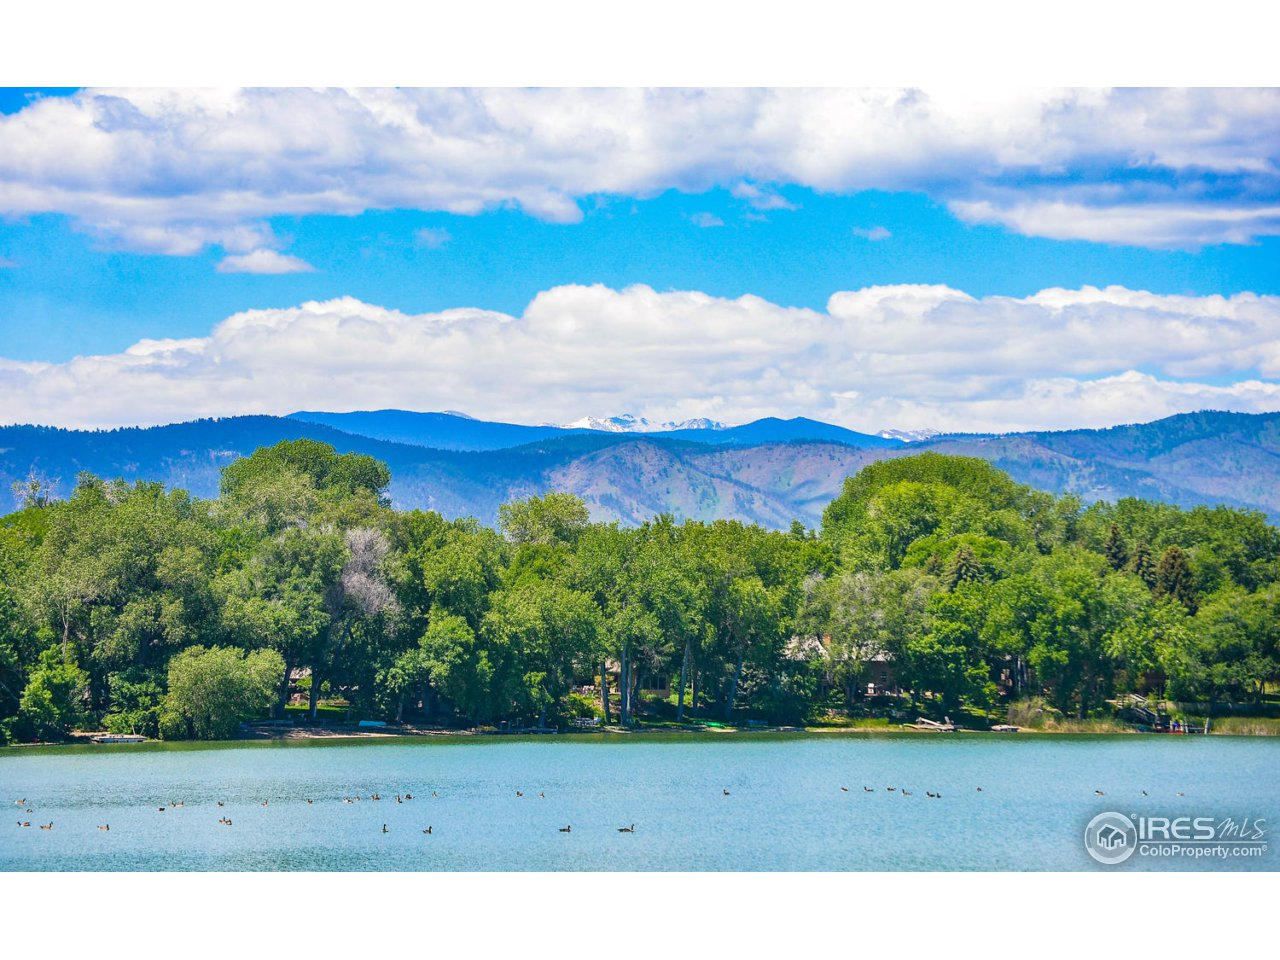 1705 Linden Lake Rd, Fort Collins, CO 80524